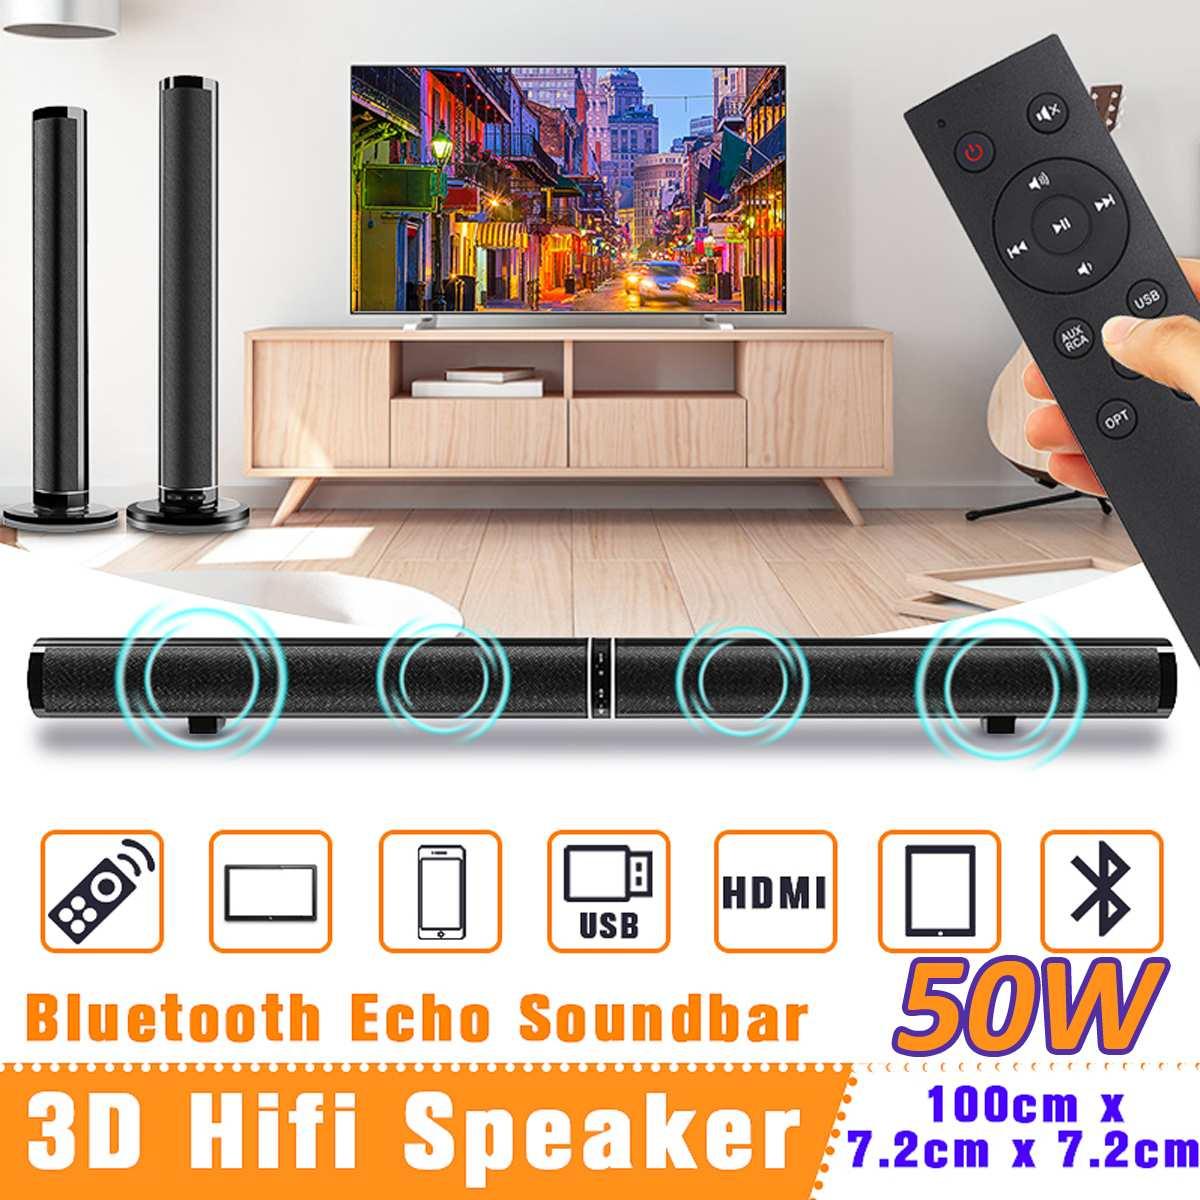 50W Wireless bluetooth TV Sound Bar Speaker Sub Woofer Surround Stereo Home Theatre System Computer Wall Soundbar